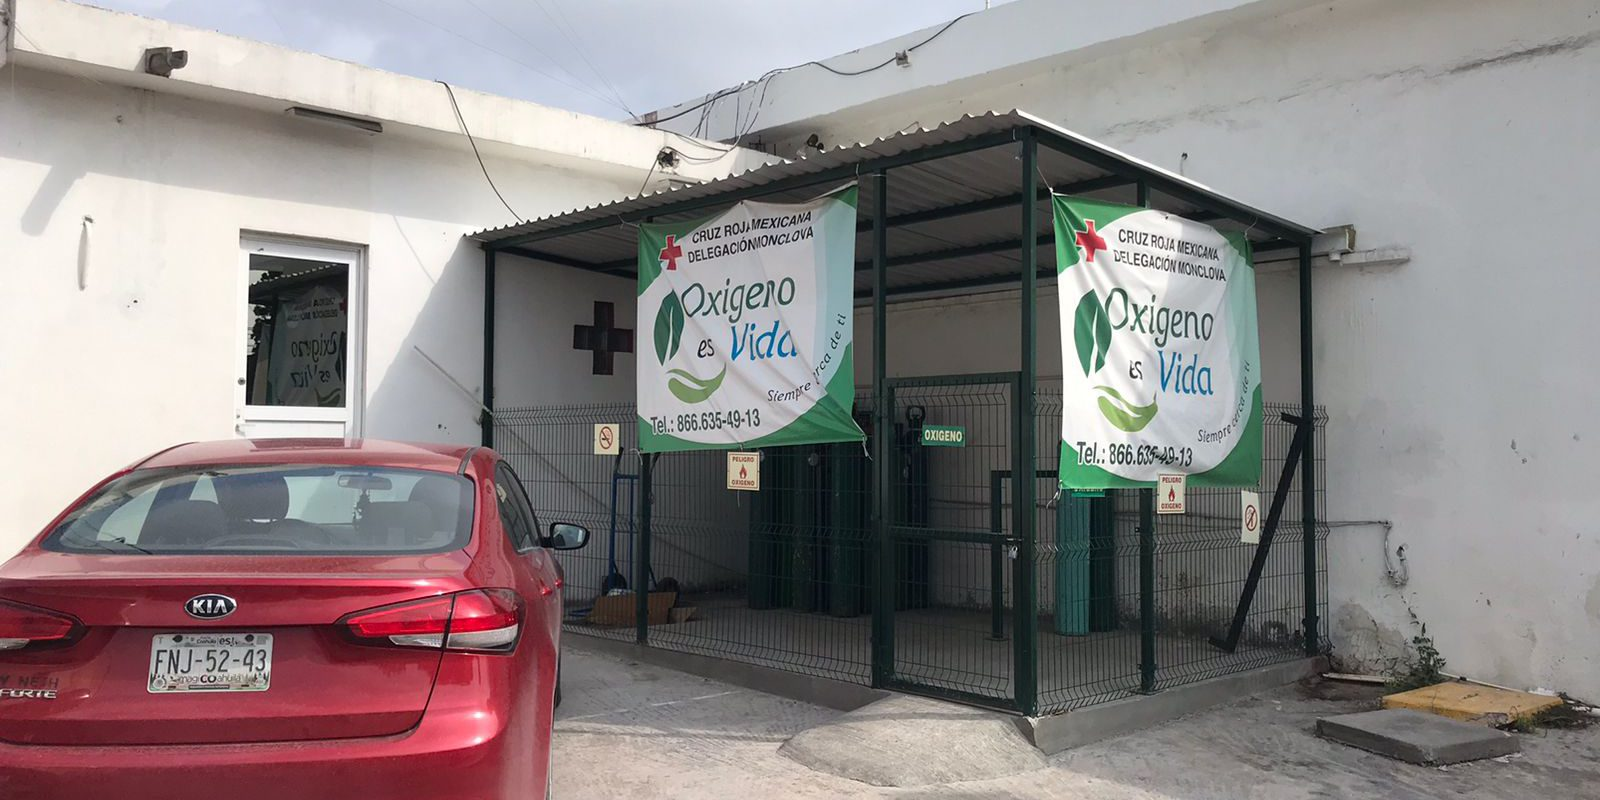 Baja requerimiento de tanques de oxígeno en Cruz Roja Monclova